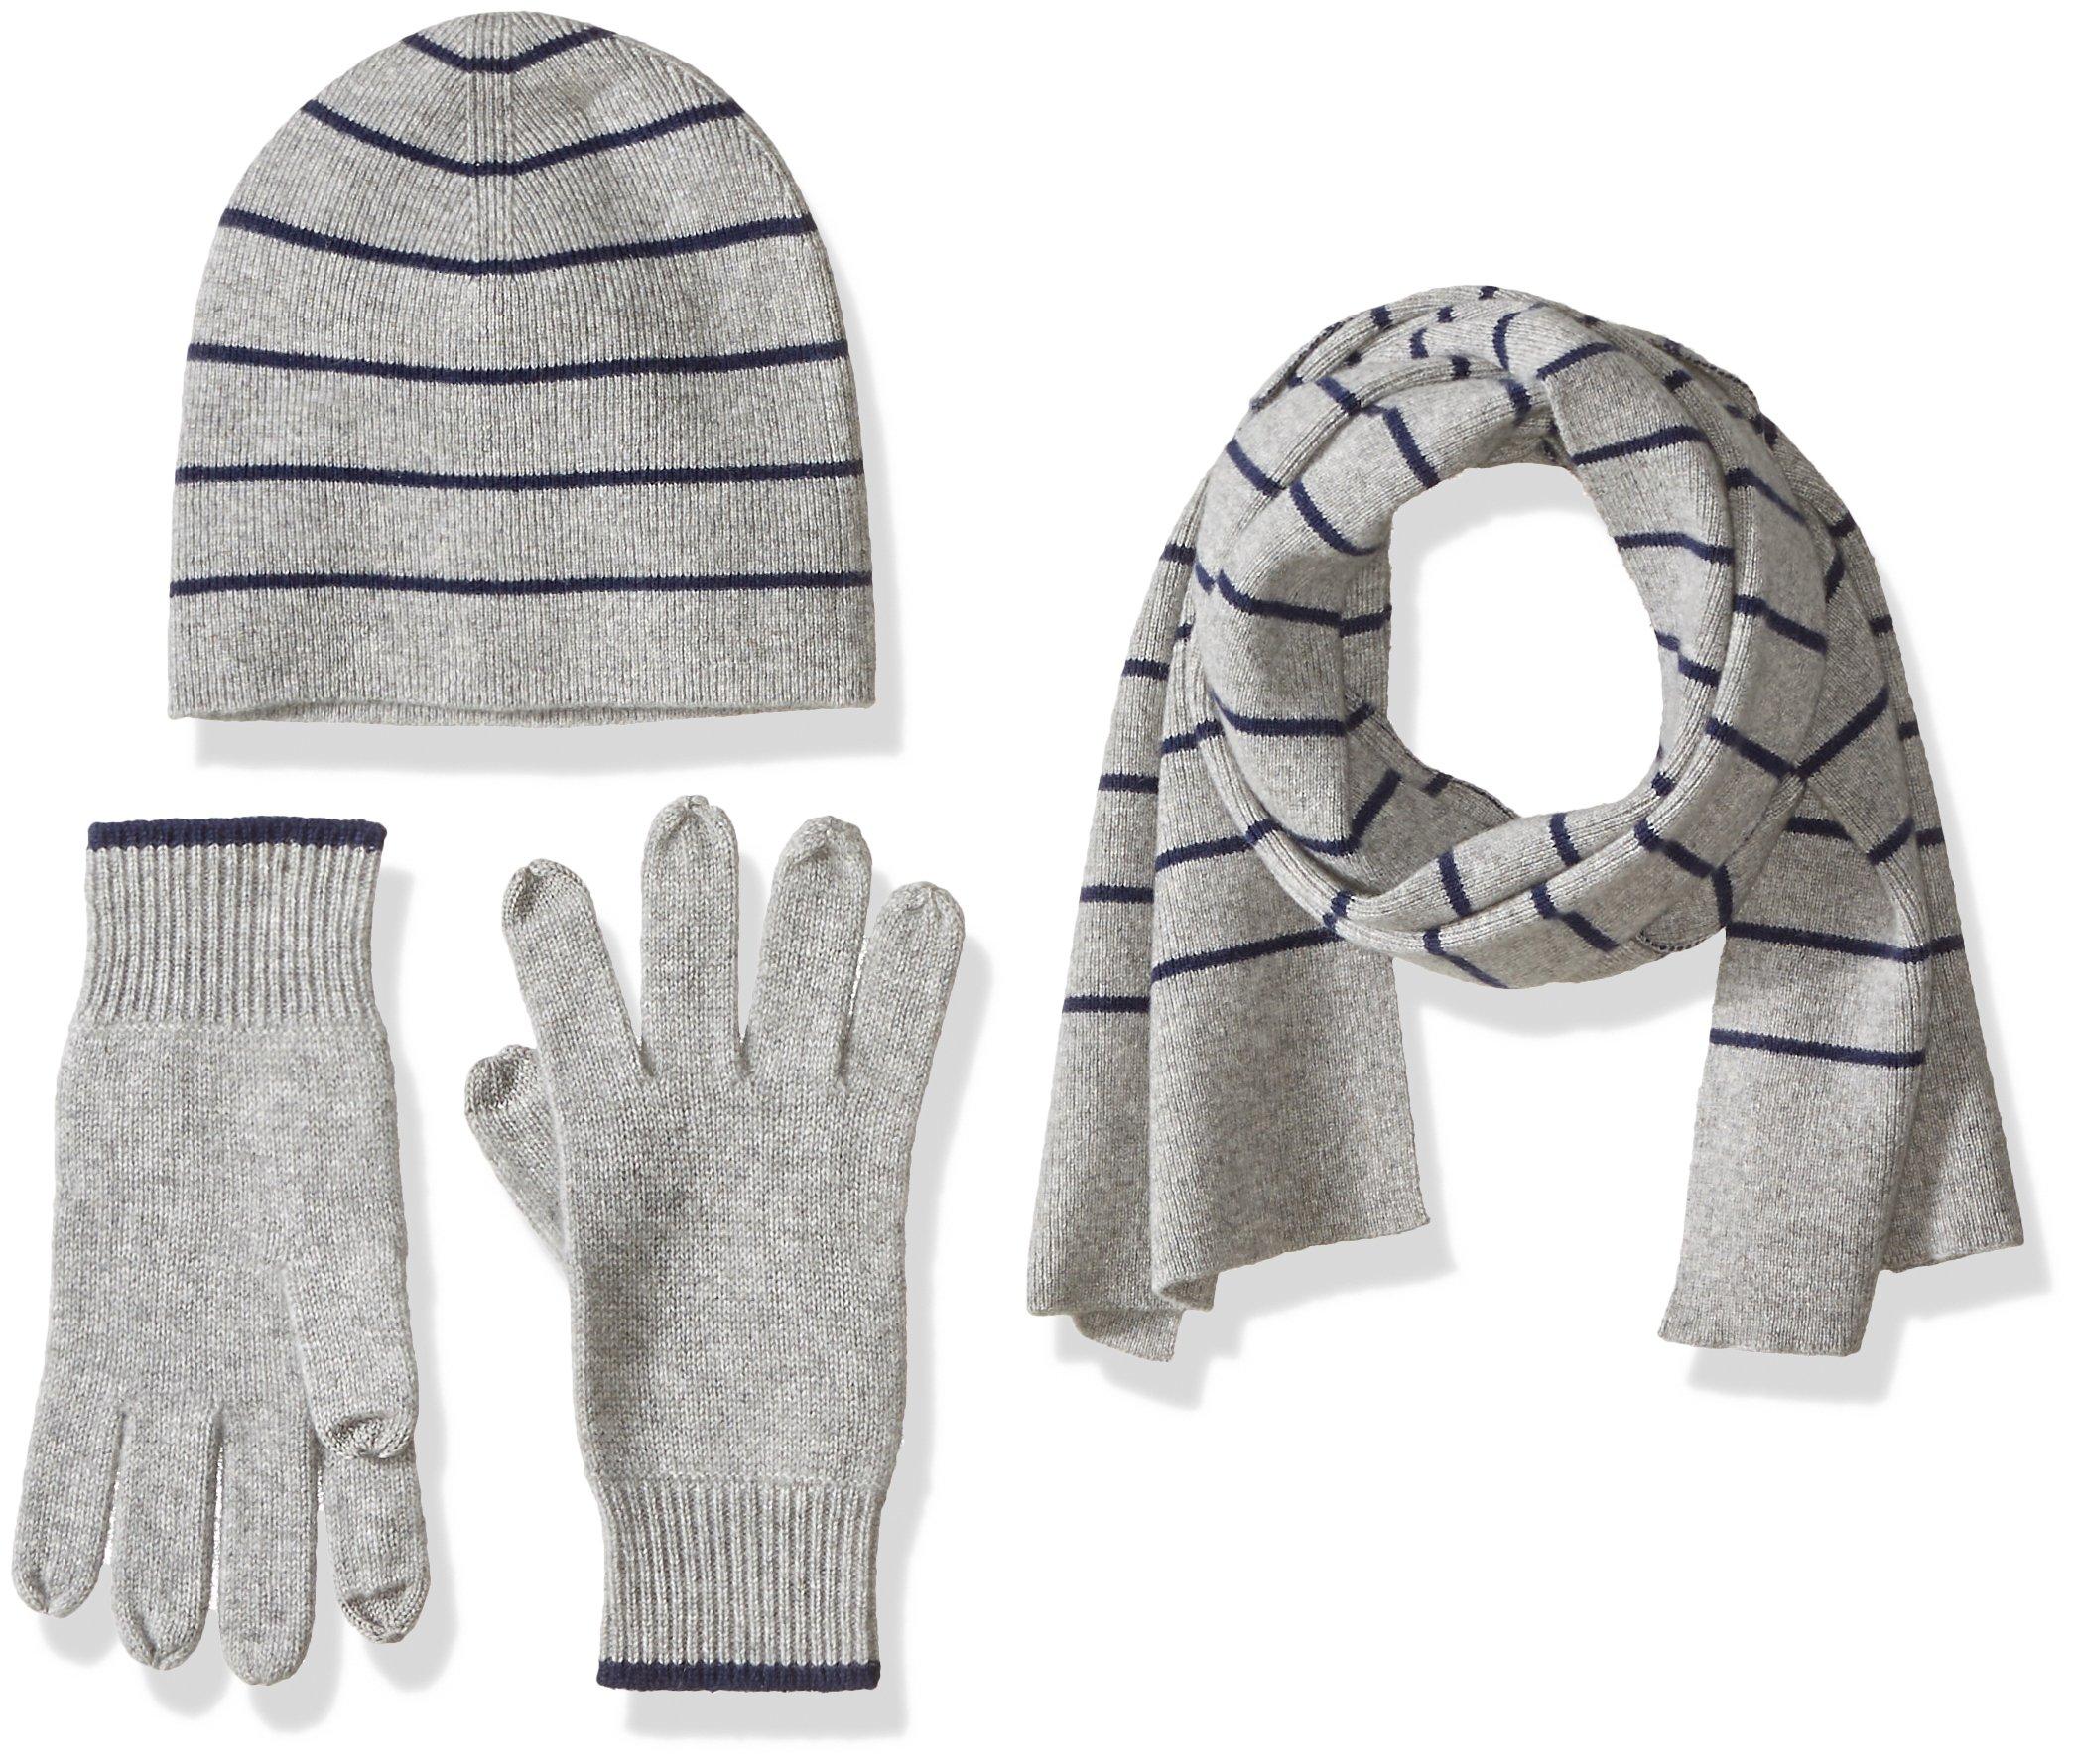 Williams Cashmere Men's 3pc Value Gift Box Set - Men's Texting Gloves, Hat, & Scarf, light grey + navy stripe, One Size